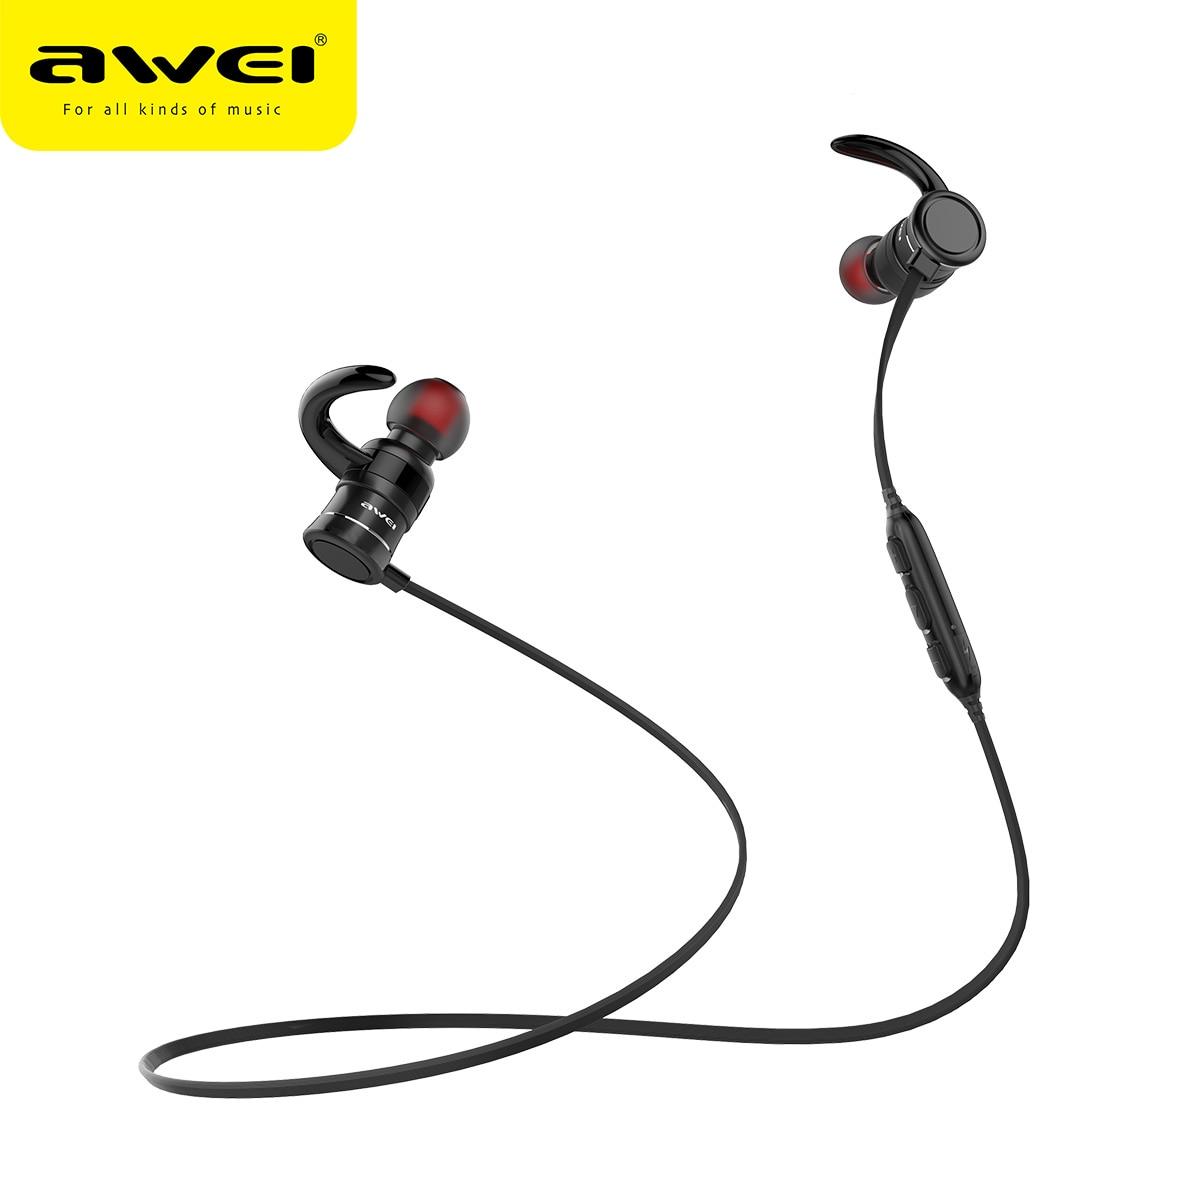 AWEI AK5 Bluetooth Heaphone Auricolare Senza Fili Con Magnetica Auricolare bluetooth Earfone Cuffie Kulakl k senza fili auricolare